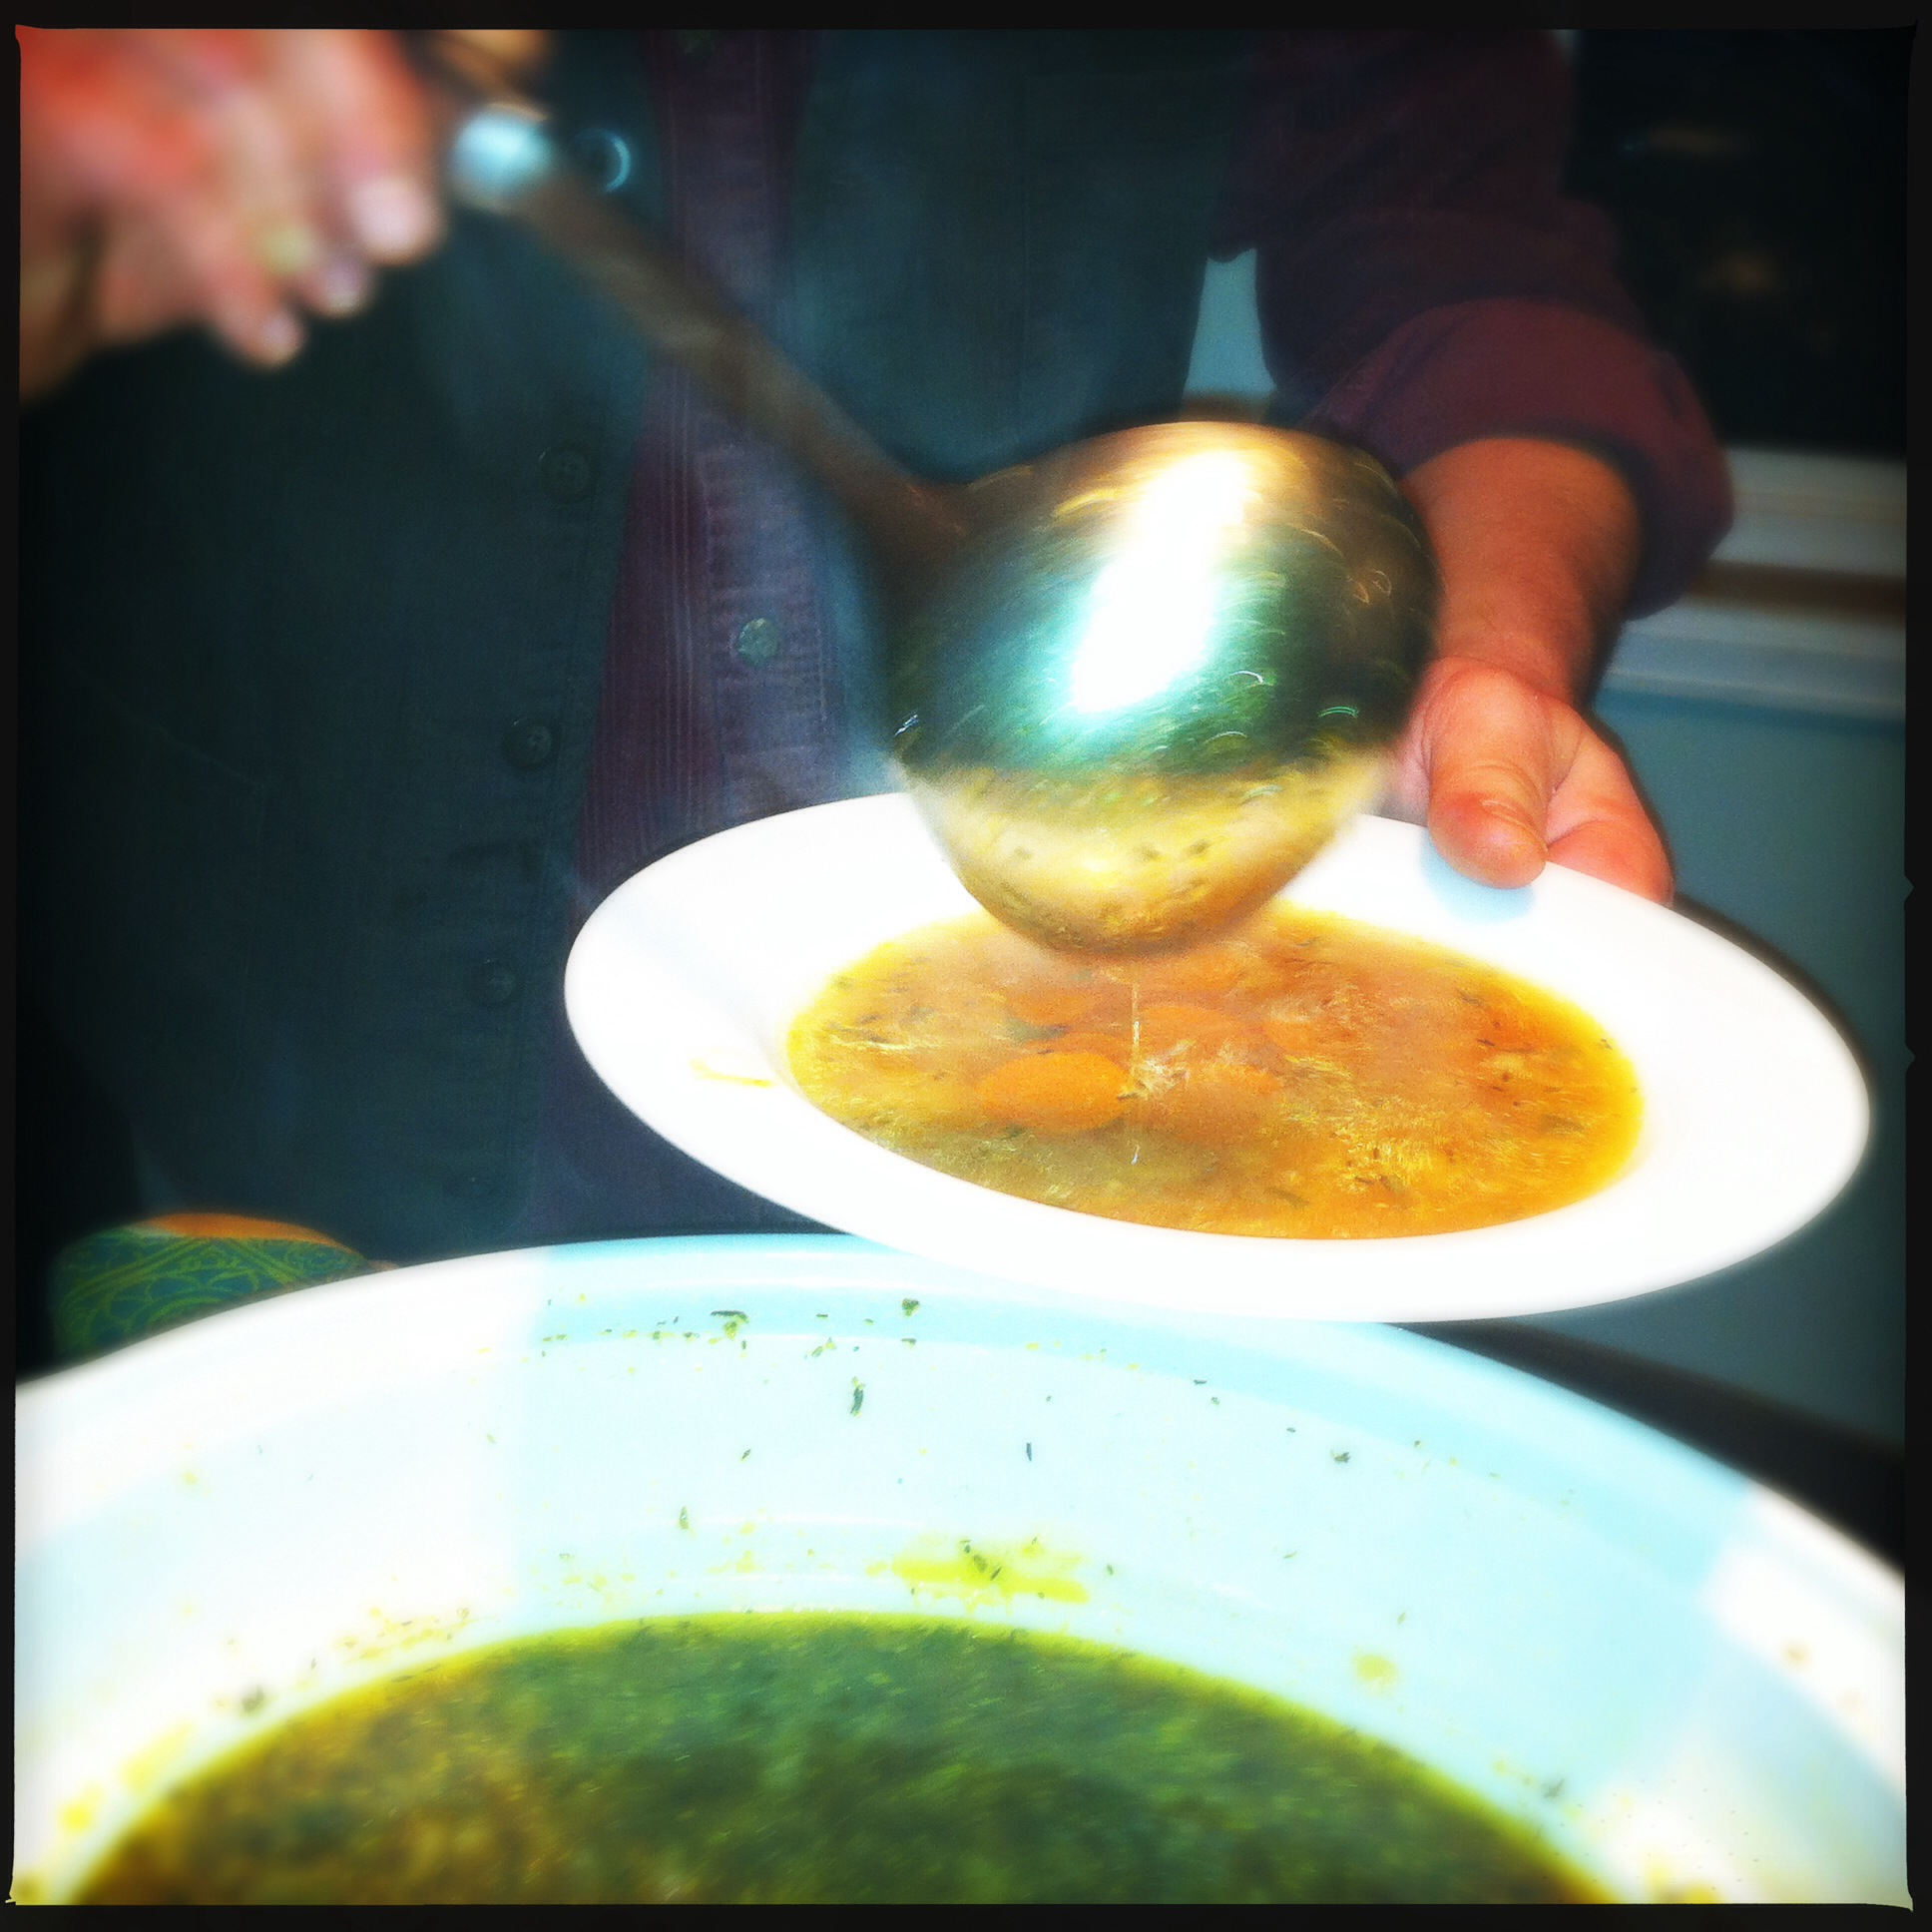 JT serves soup